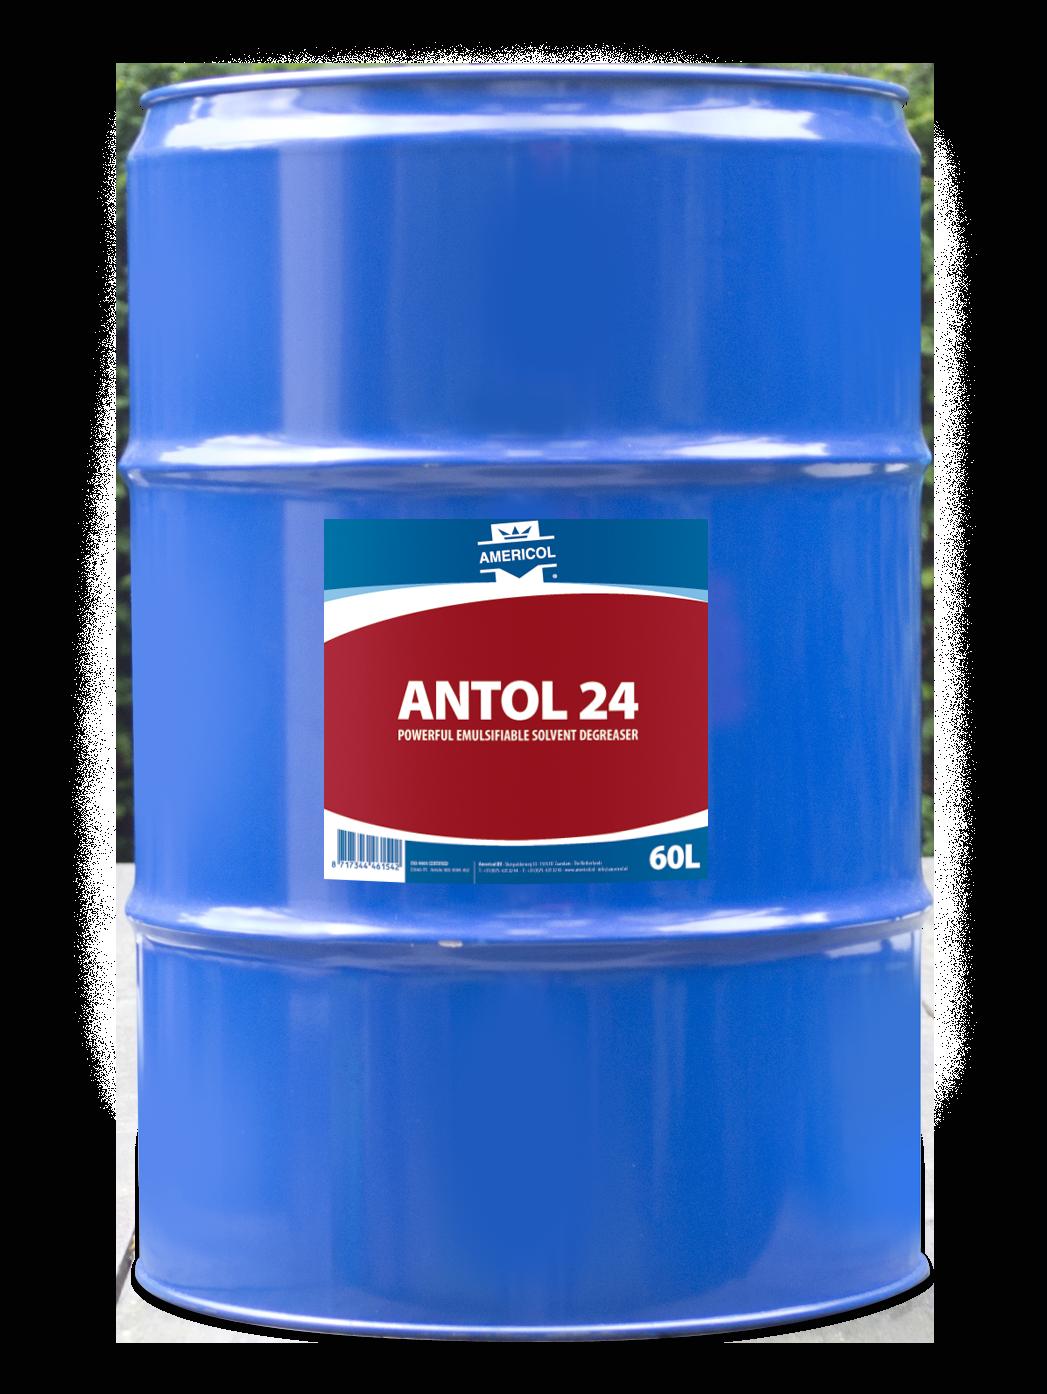 Antol 24 60 L